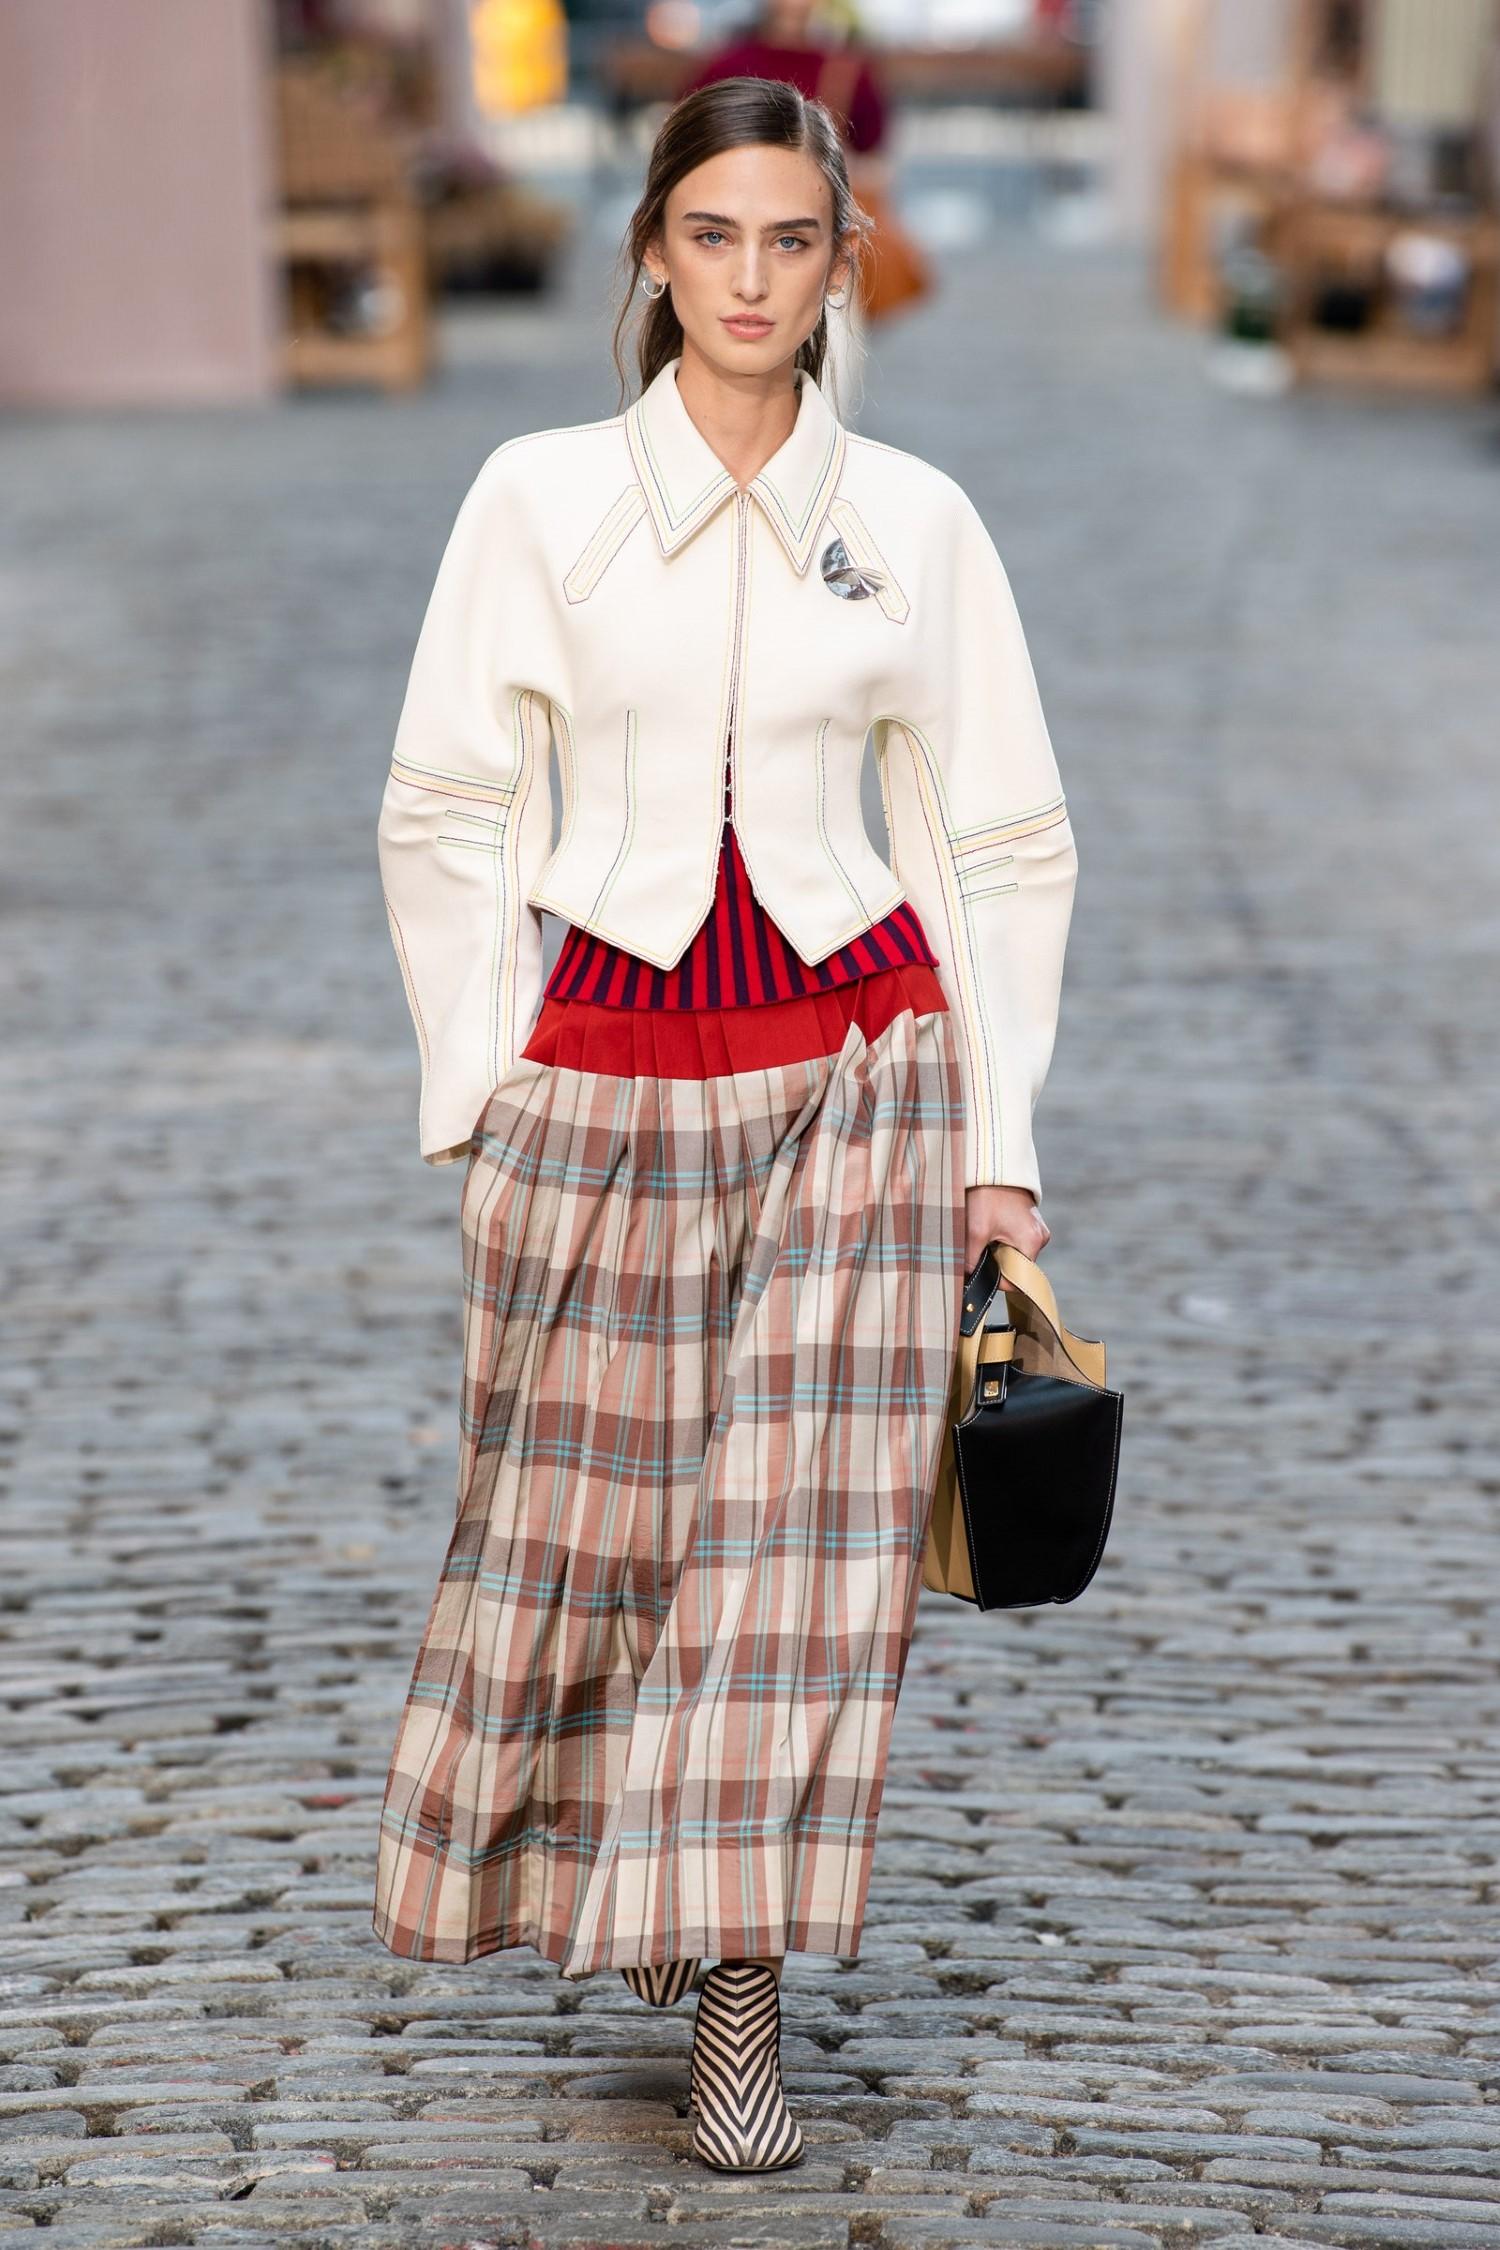 Tory Burch Spring Summer 2022 - New York Fashion WeekTory Burch Spring Summer 2022 - New York Fashion Week